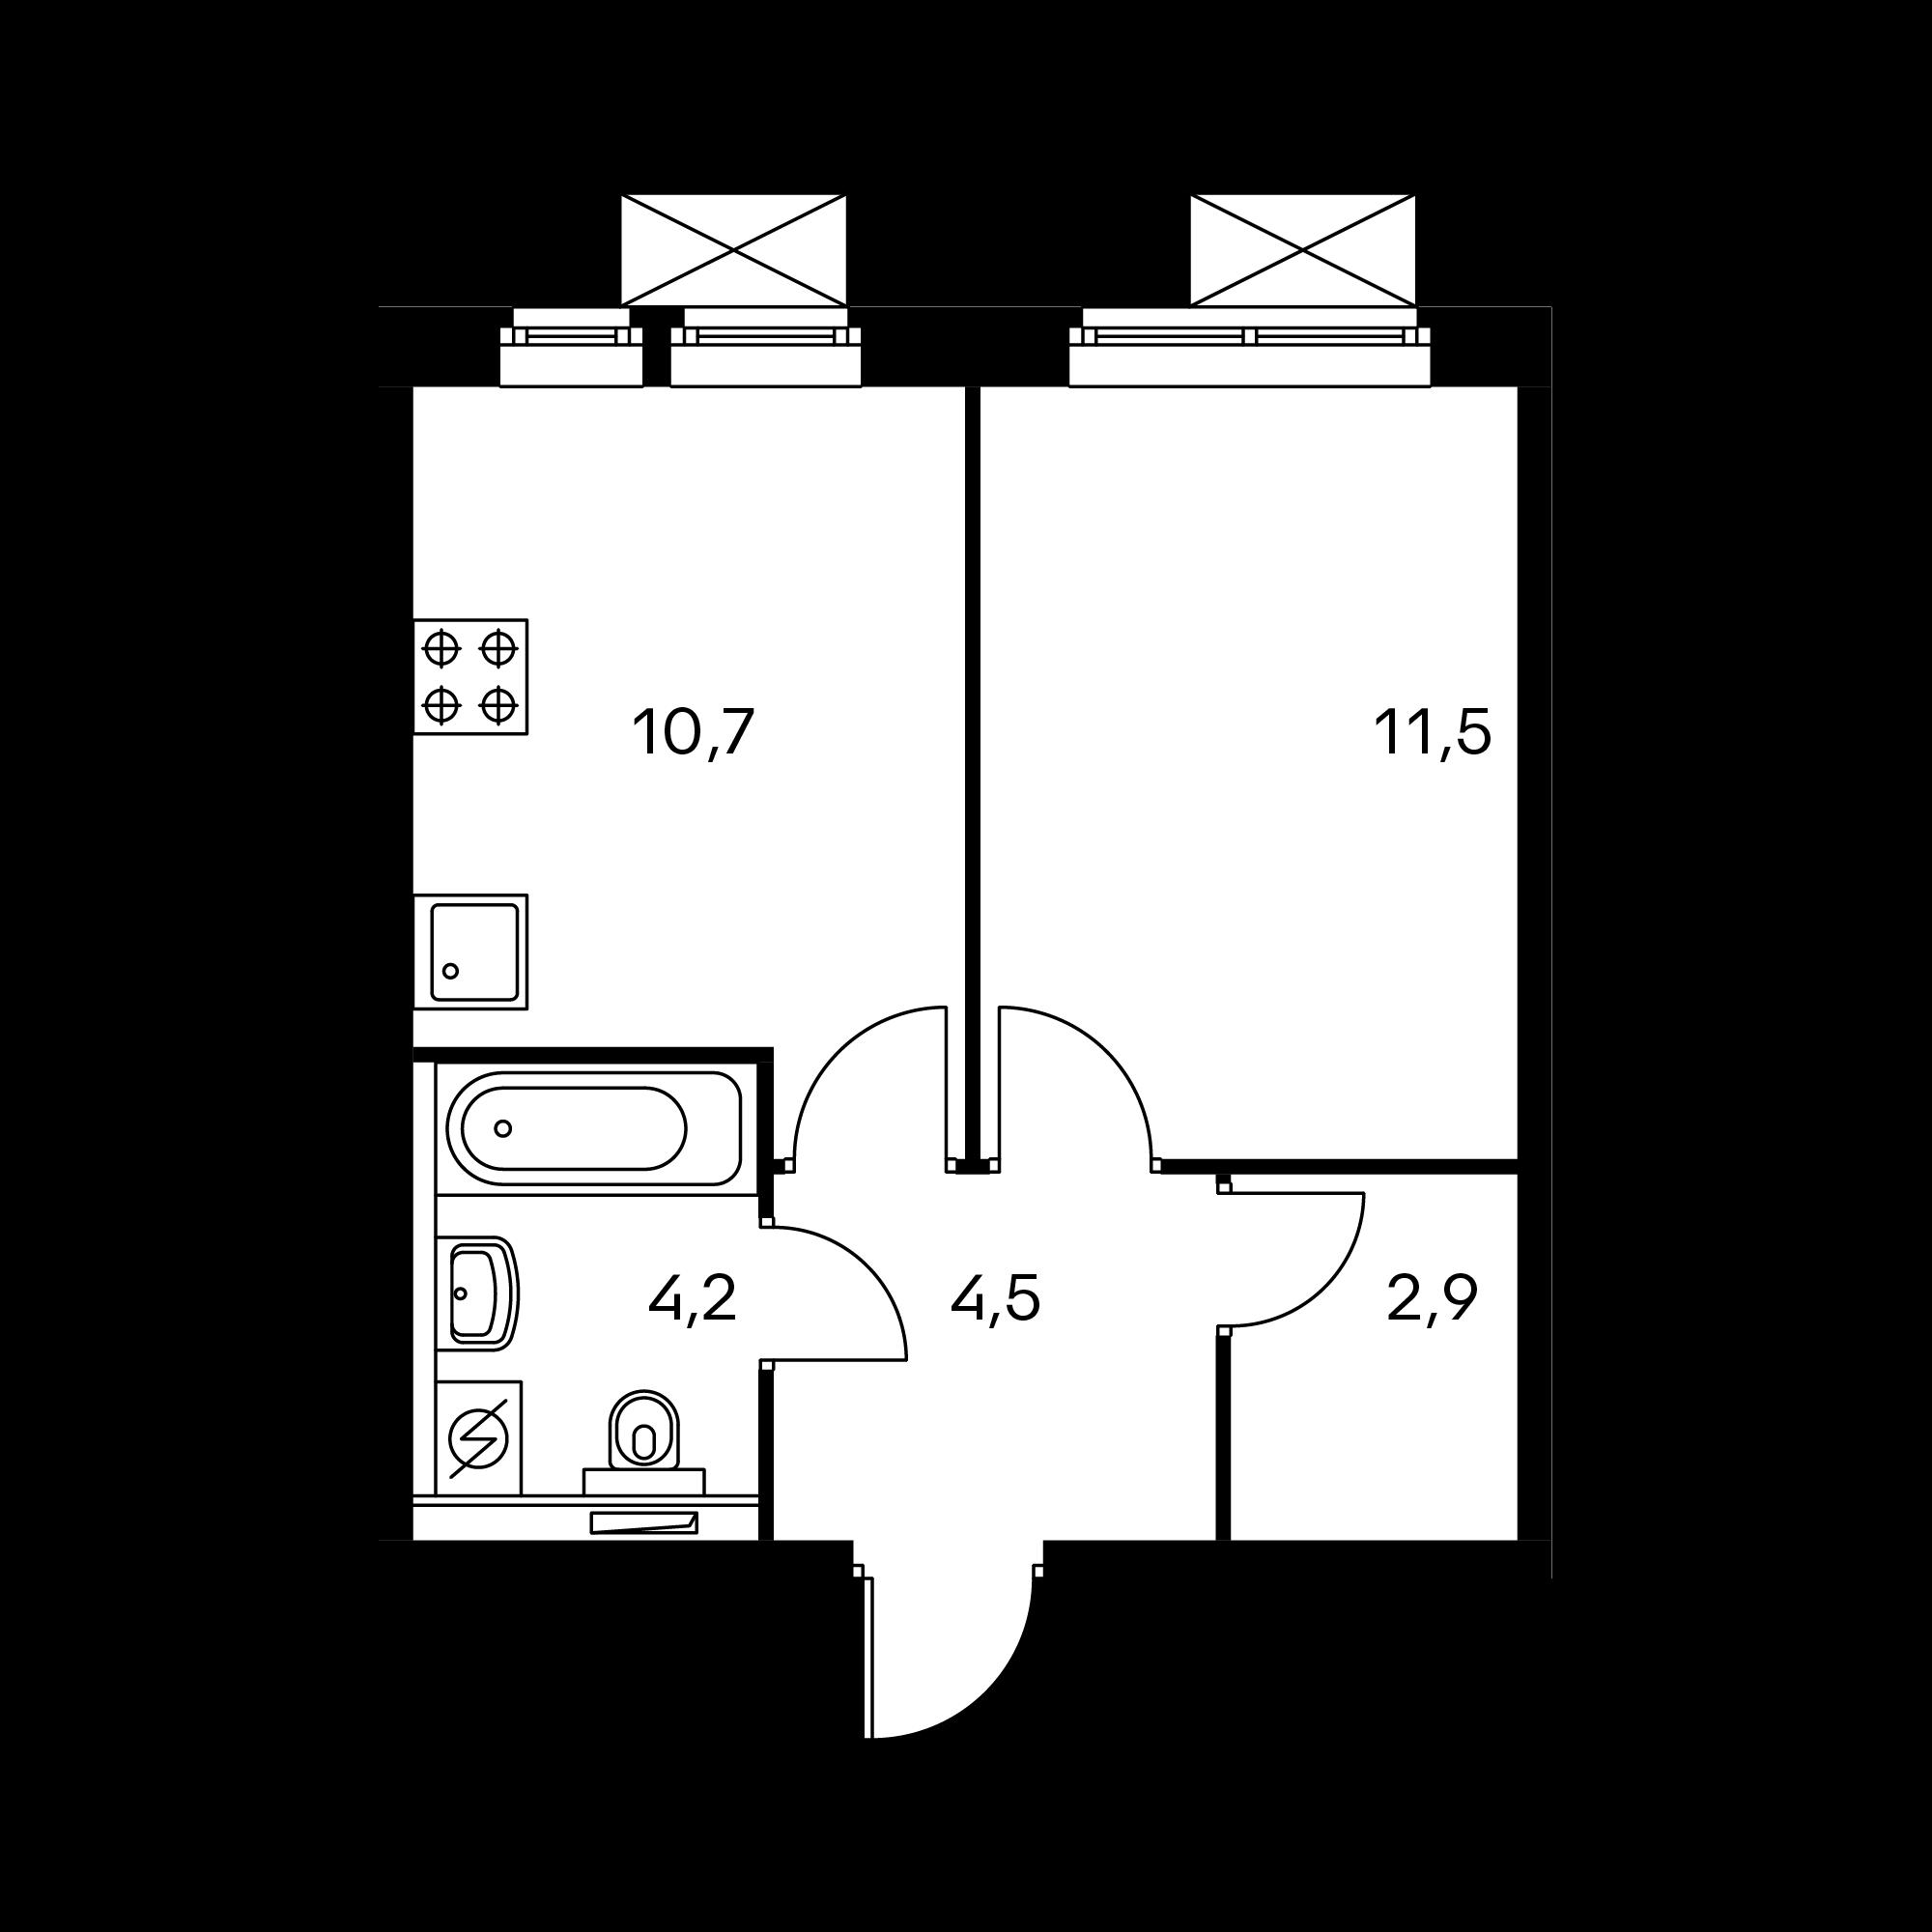 1KS1_6.0-2